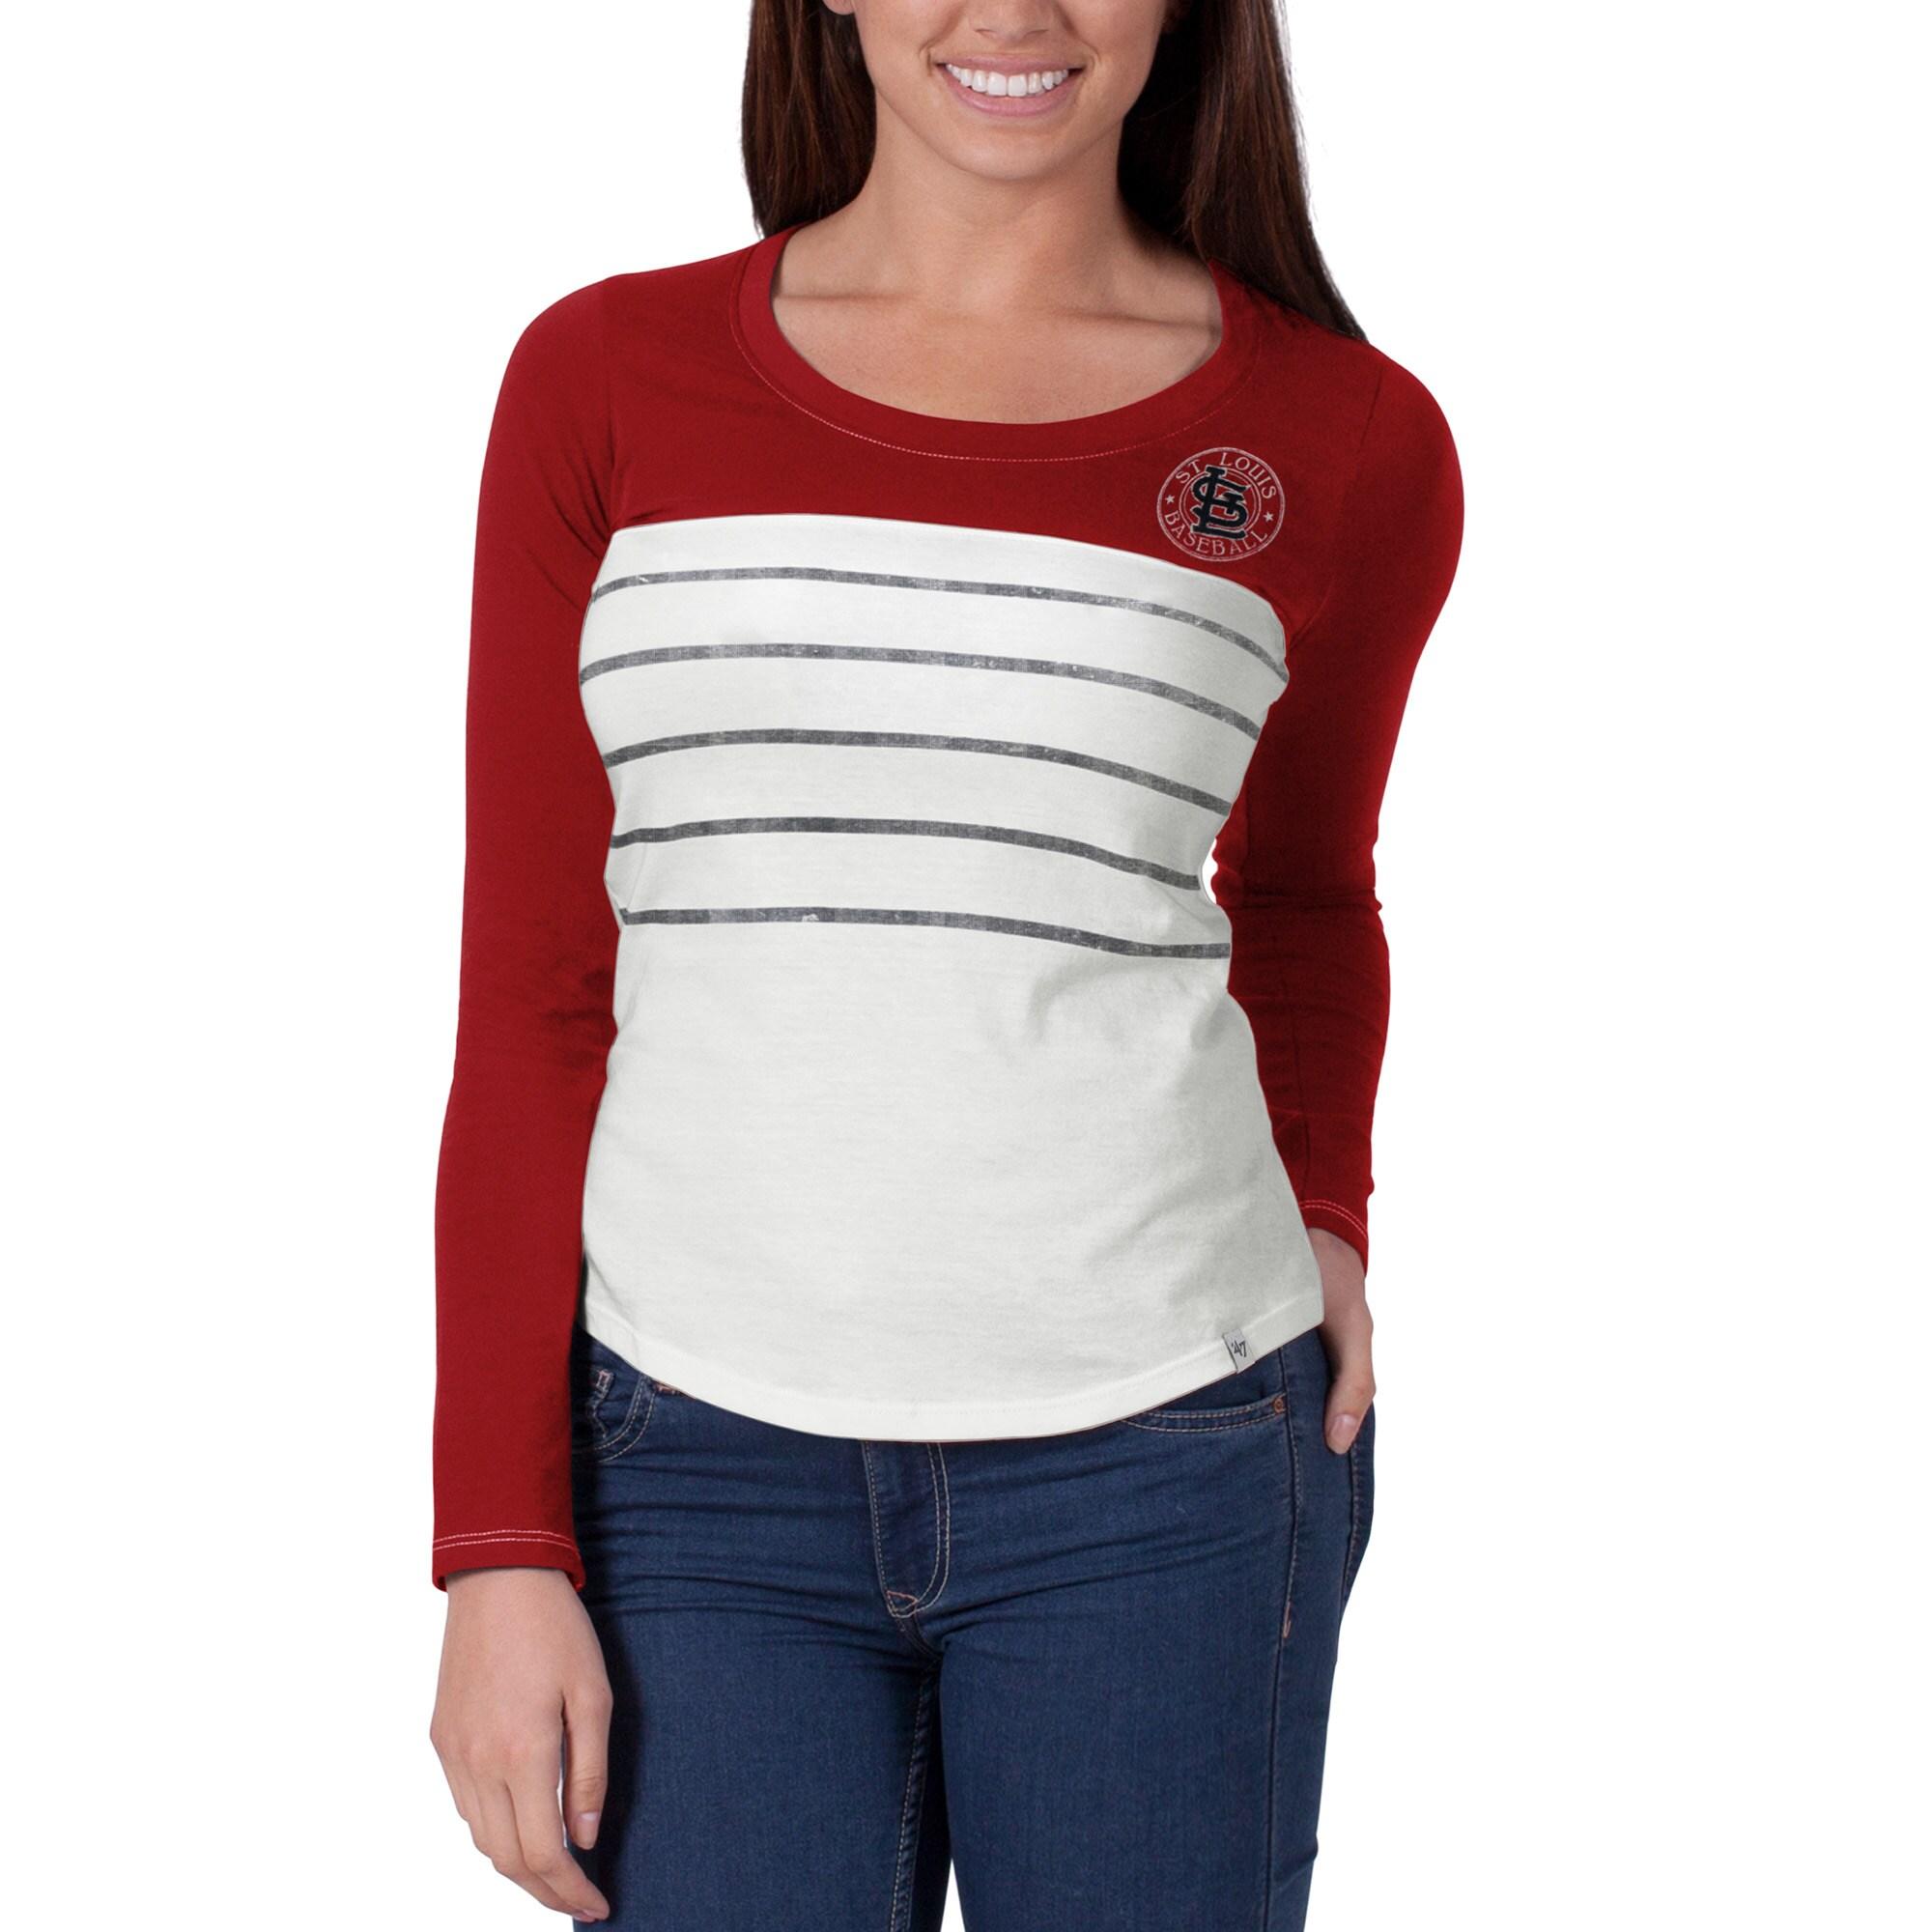 St. Louis Cardinals '47 Women's Breakers T-Shirt - Red